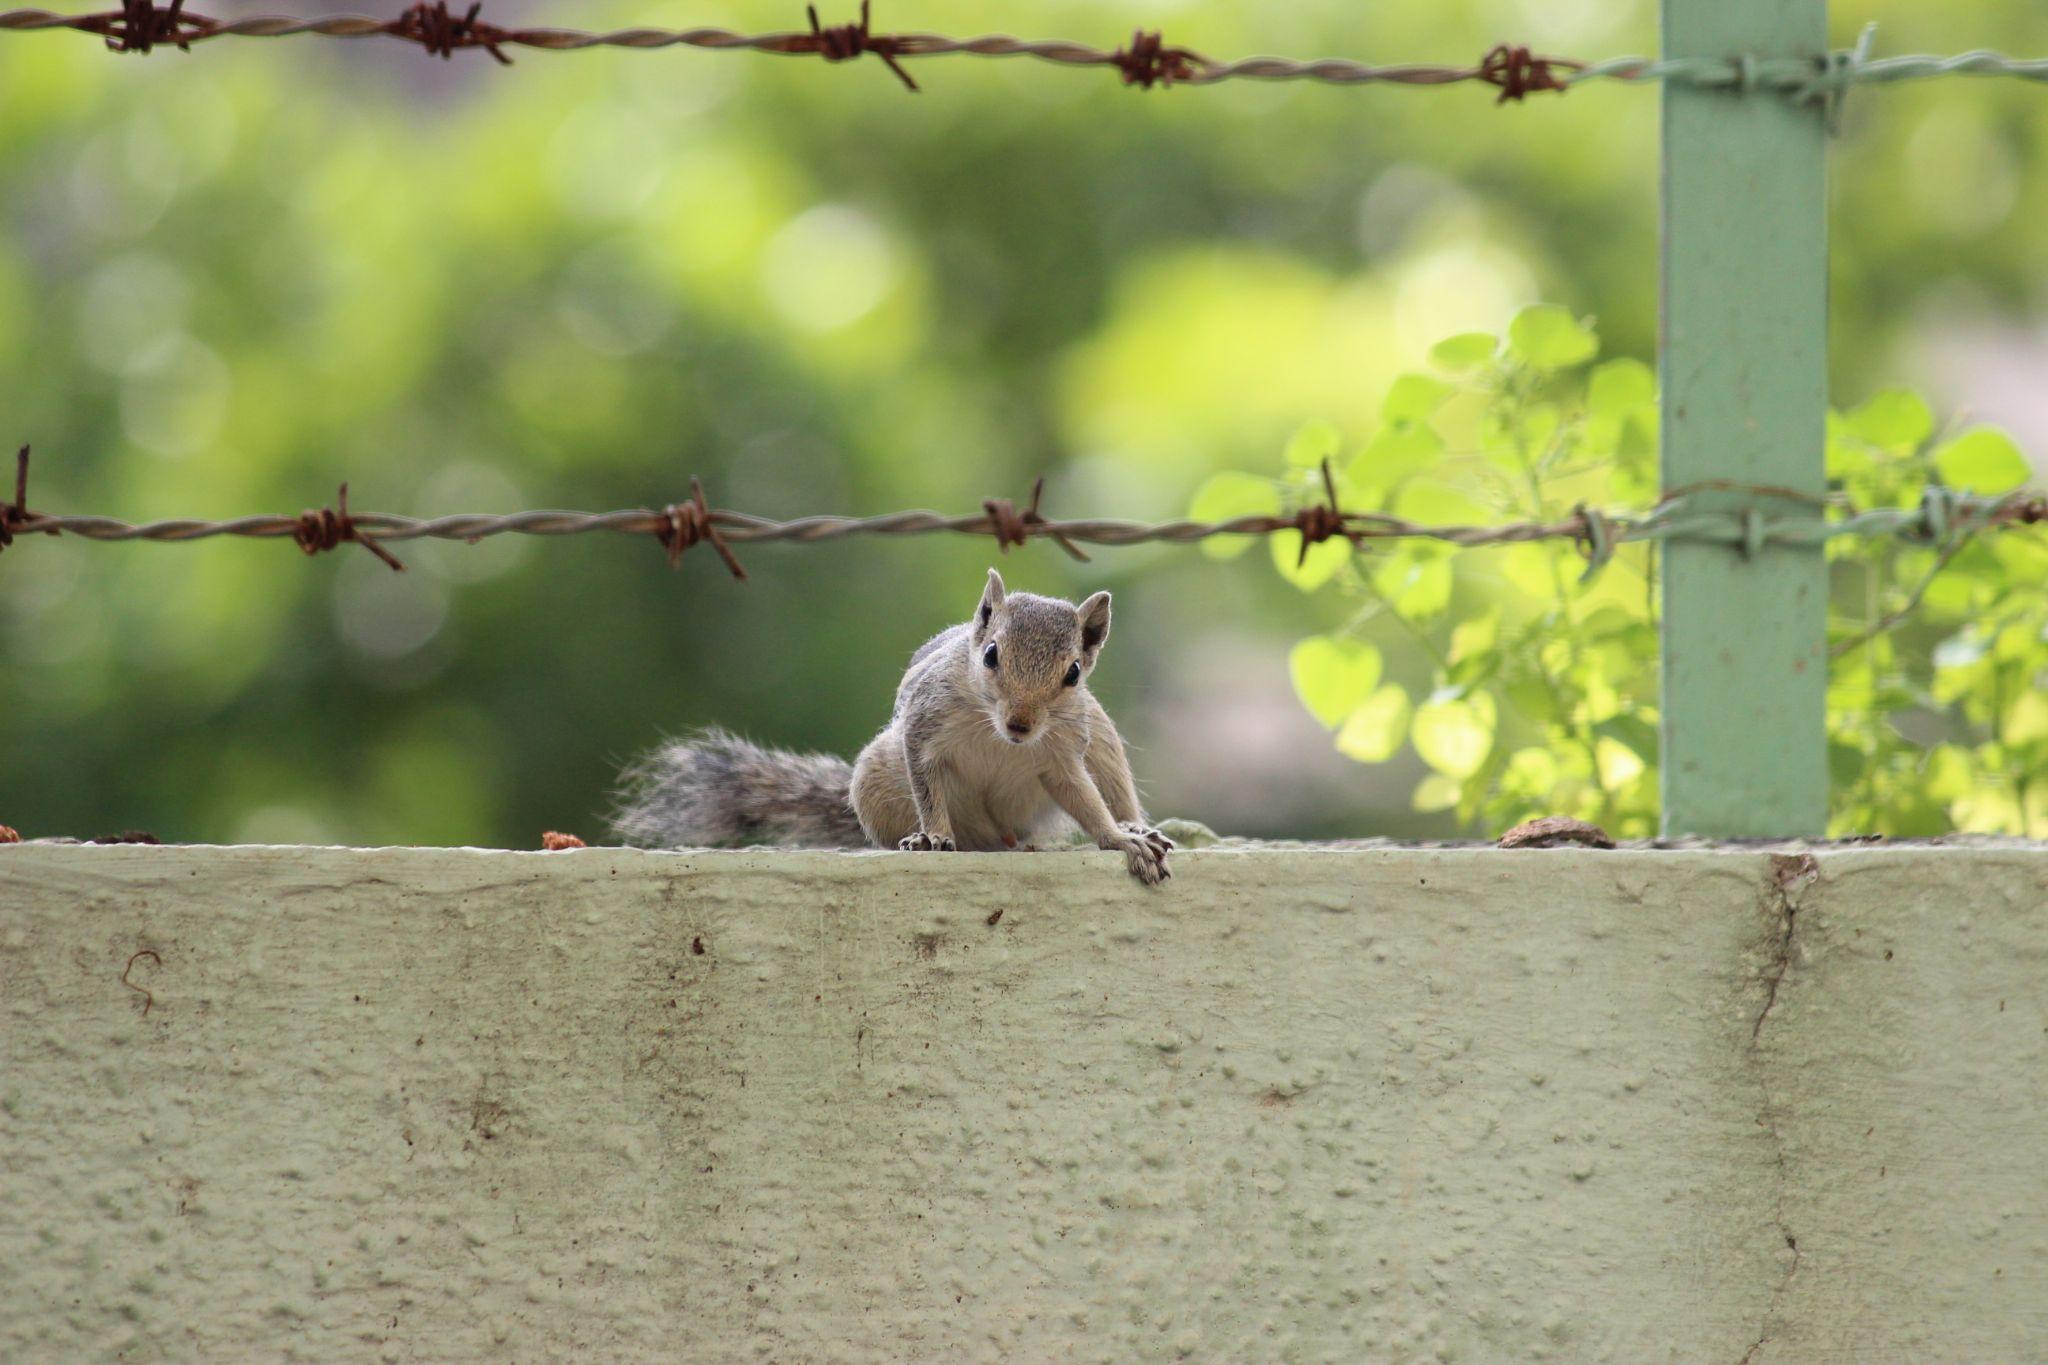 Squirrel, Attentive. by Nirav Mehta